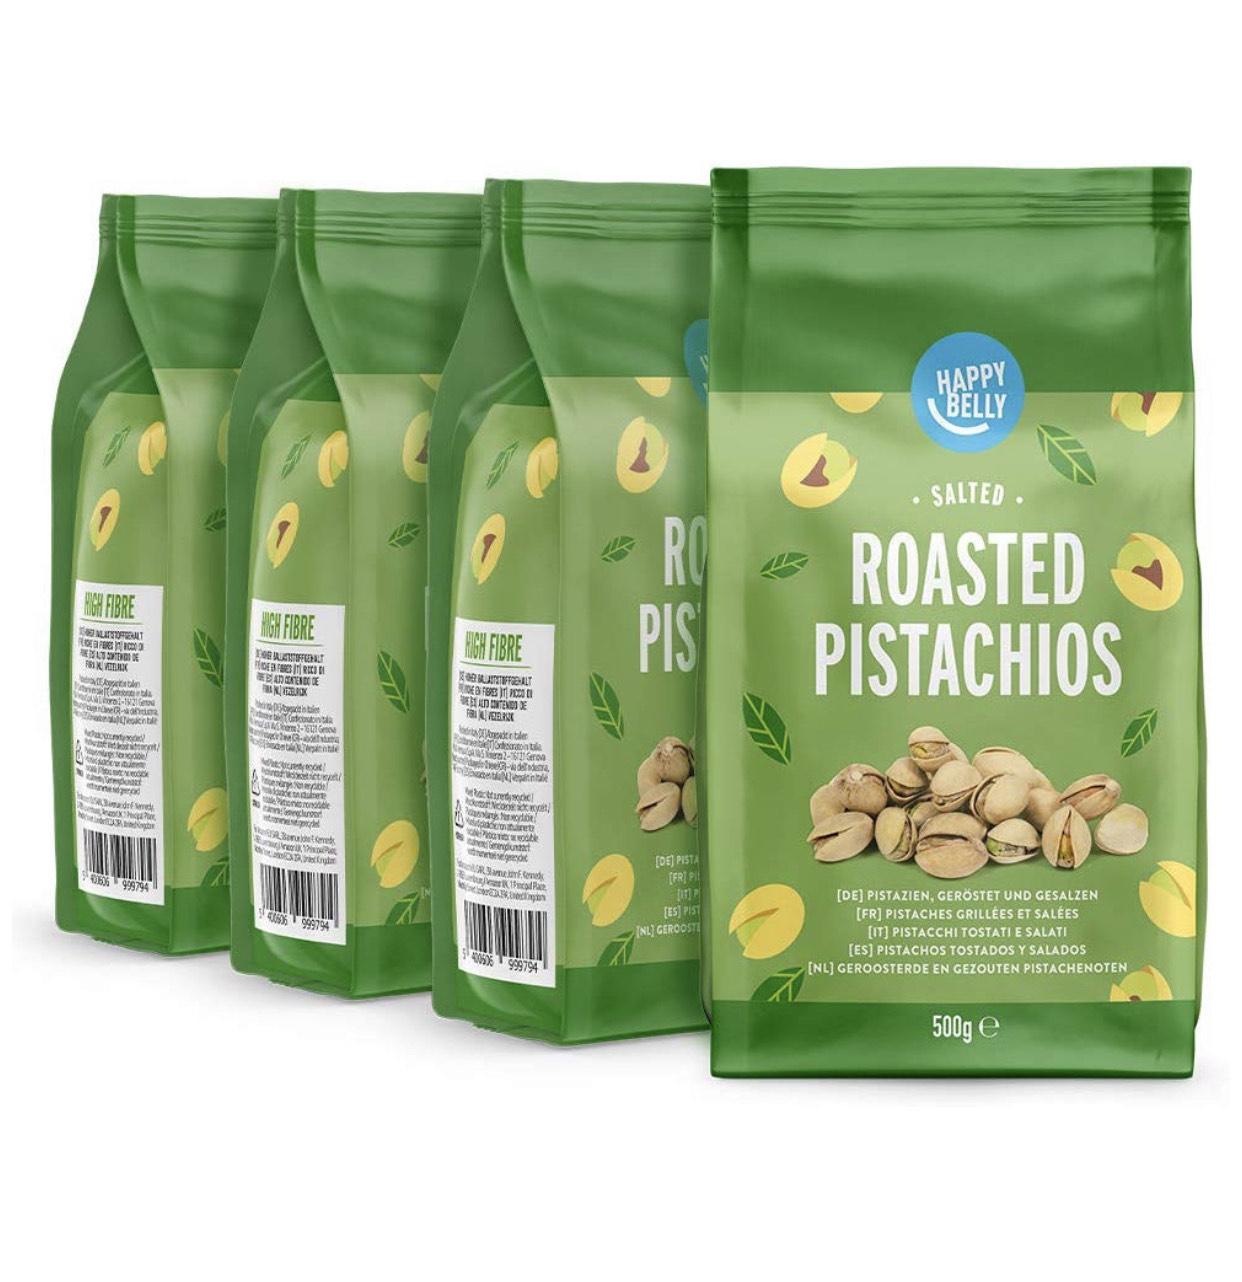 Pistachos Happy Belly 4 paquetes de 500g (¡2kg!)